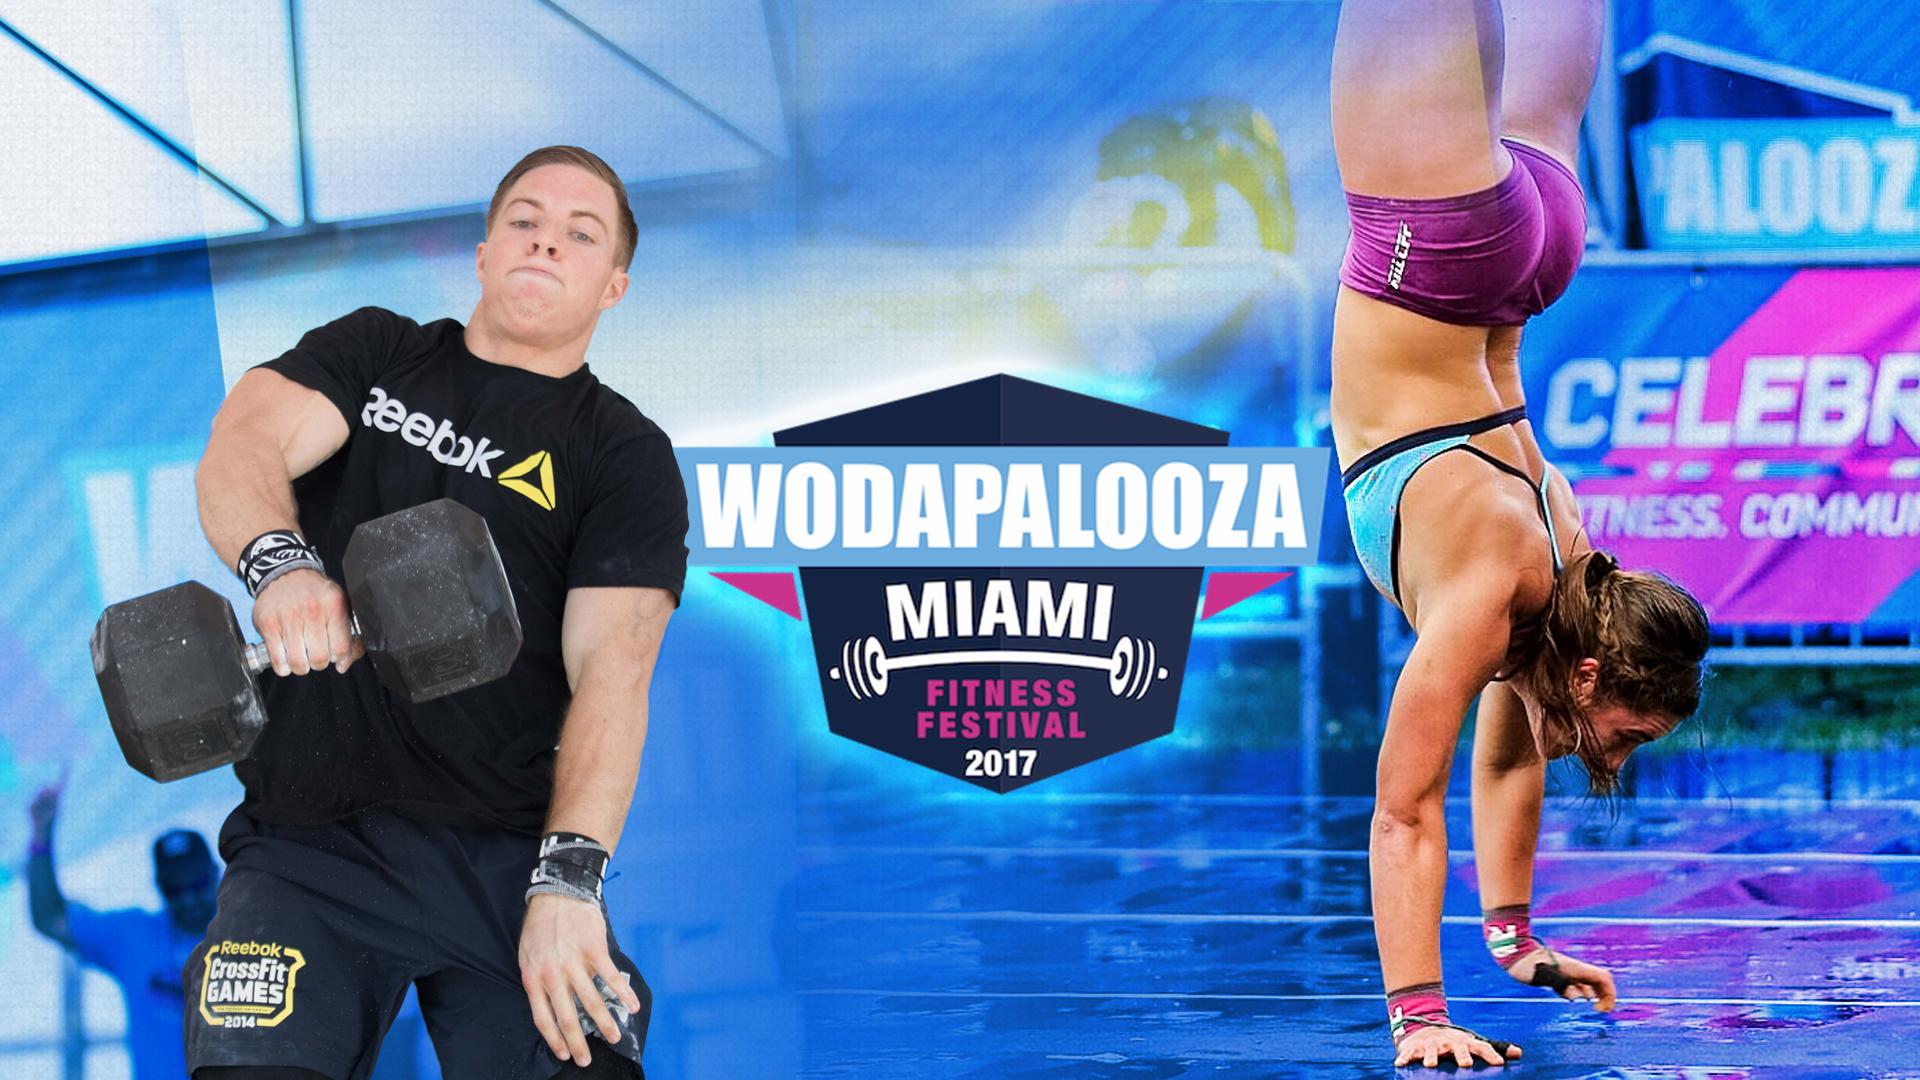 wodapalooza fitness festival 2017 floelite